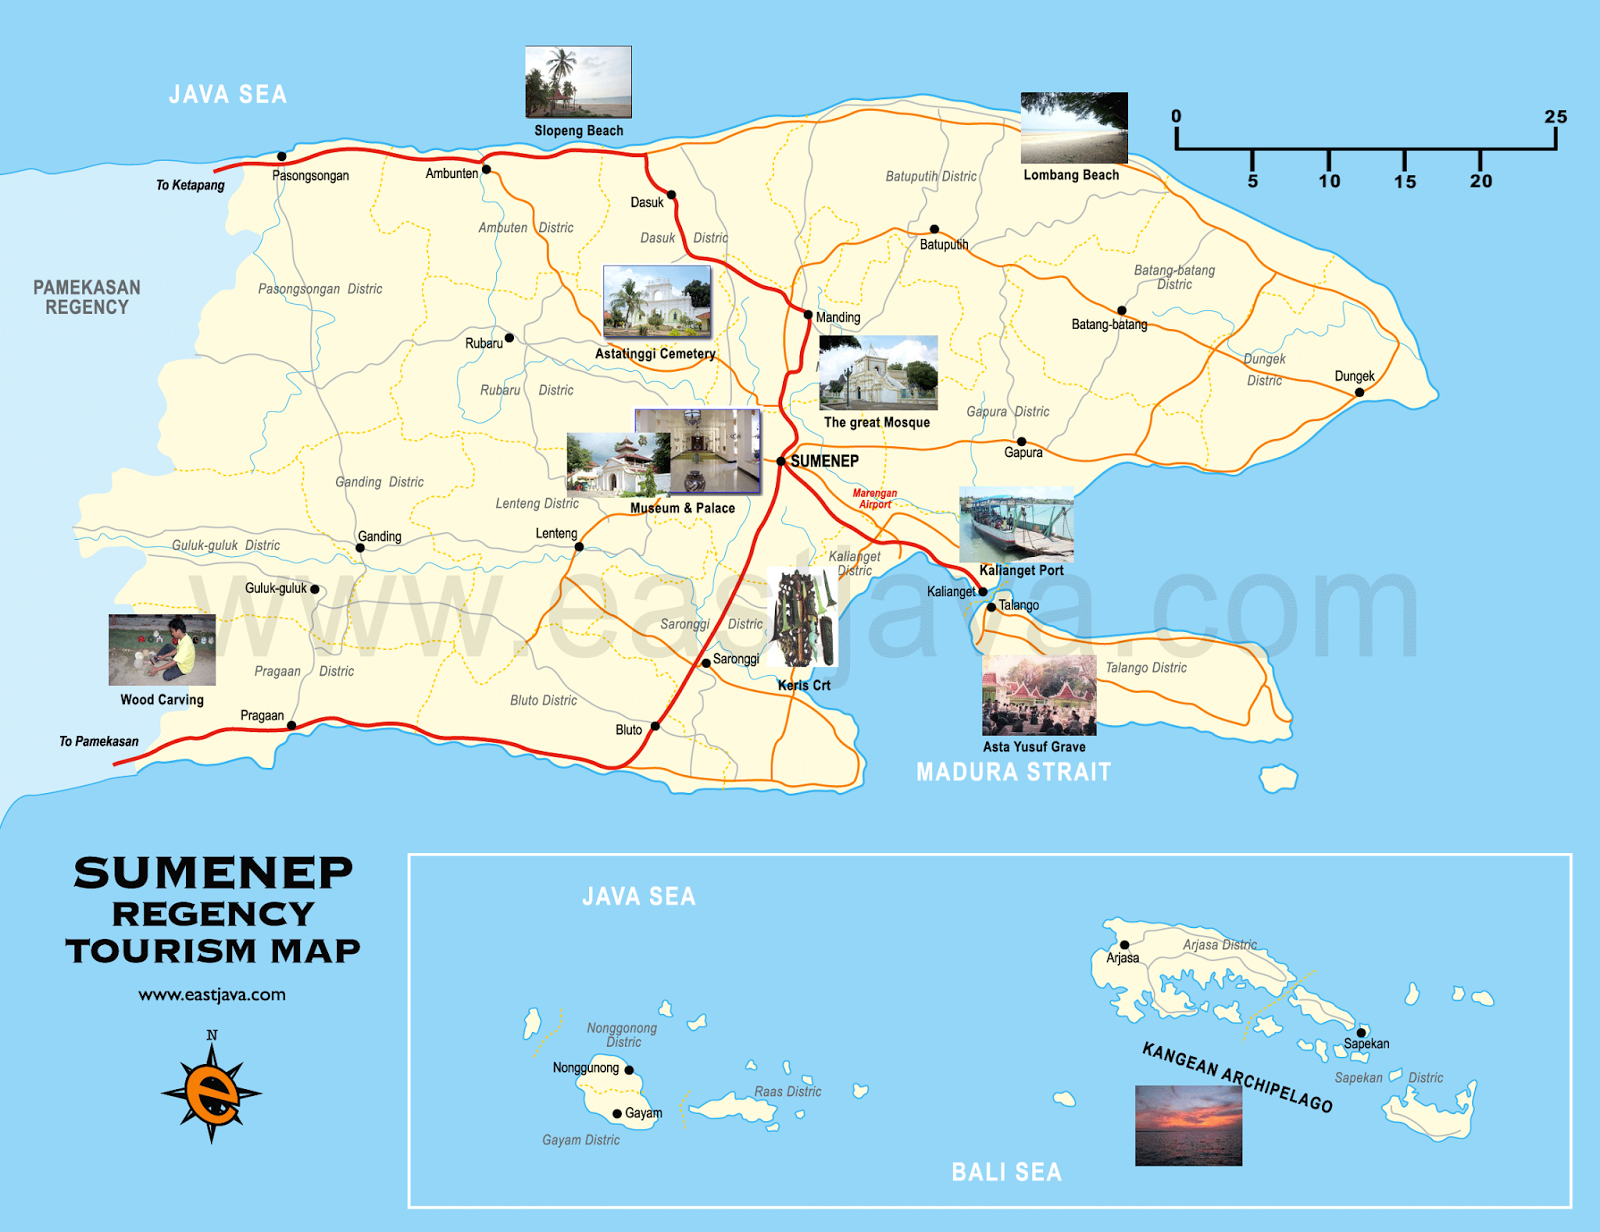 Lihat Baca Rasakan Daerah Asalku Kabupaten Sumenep Sentra Batik Pekandangan